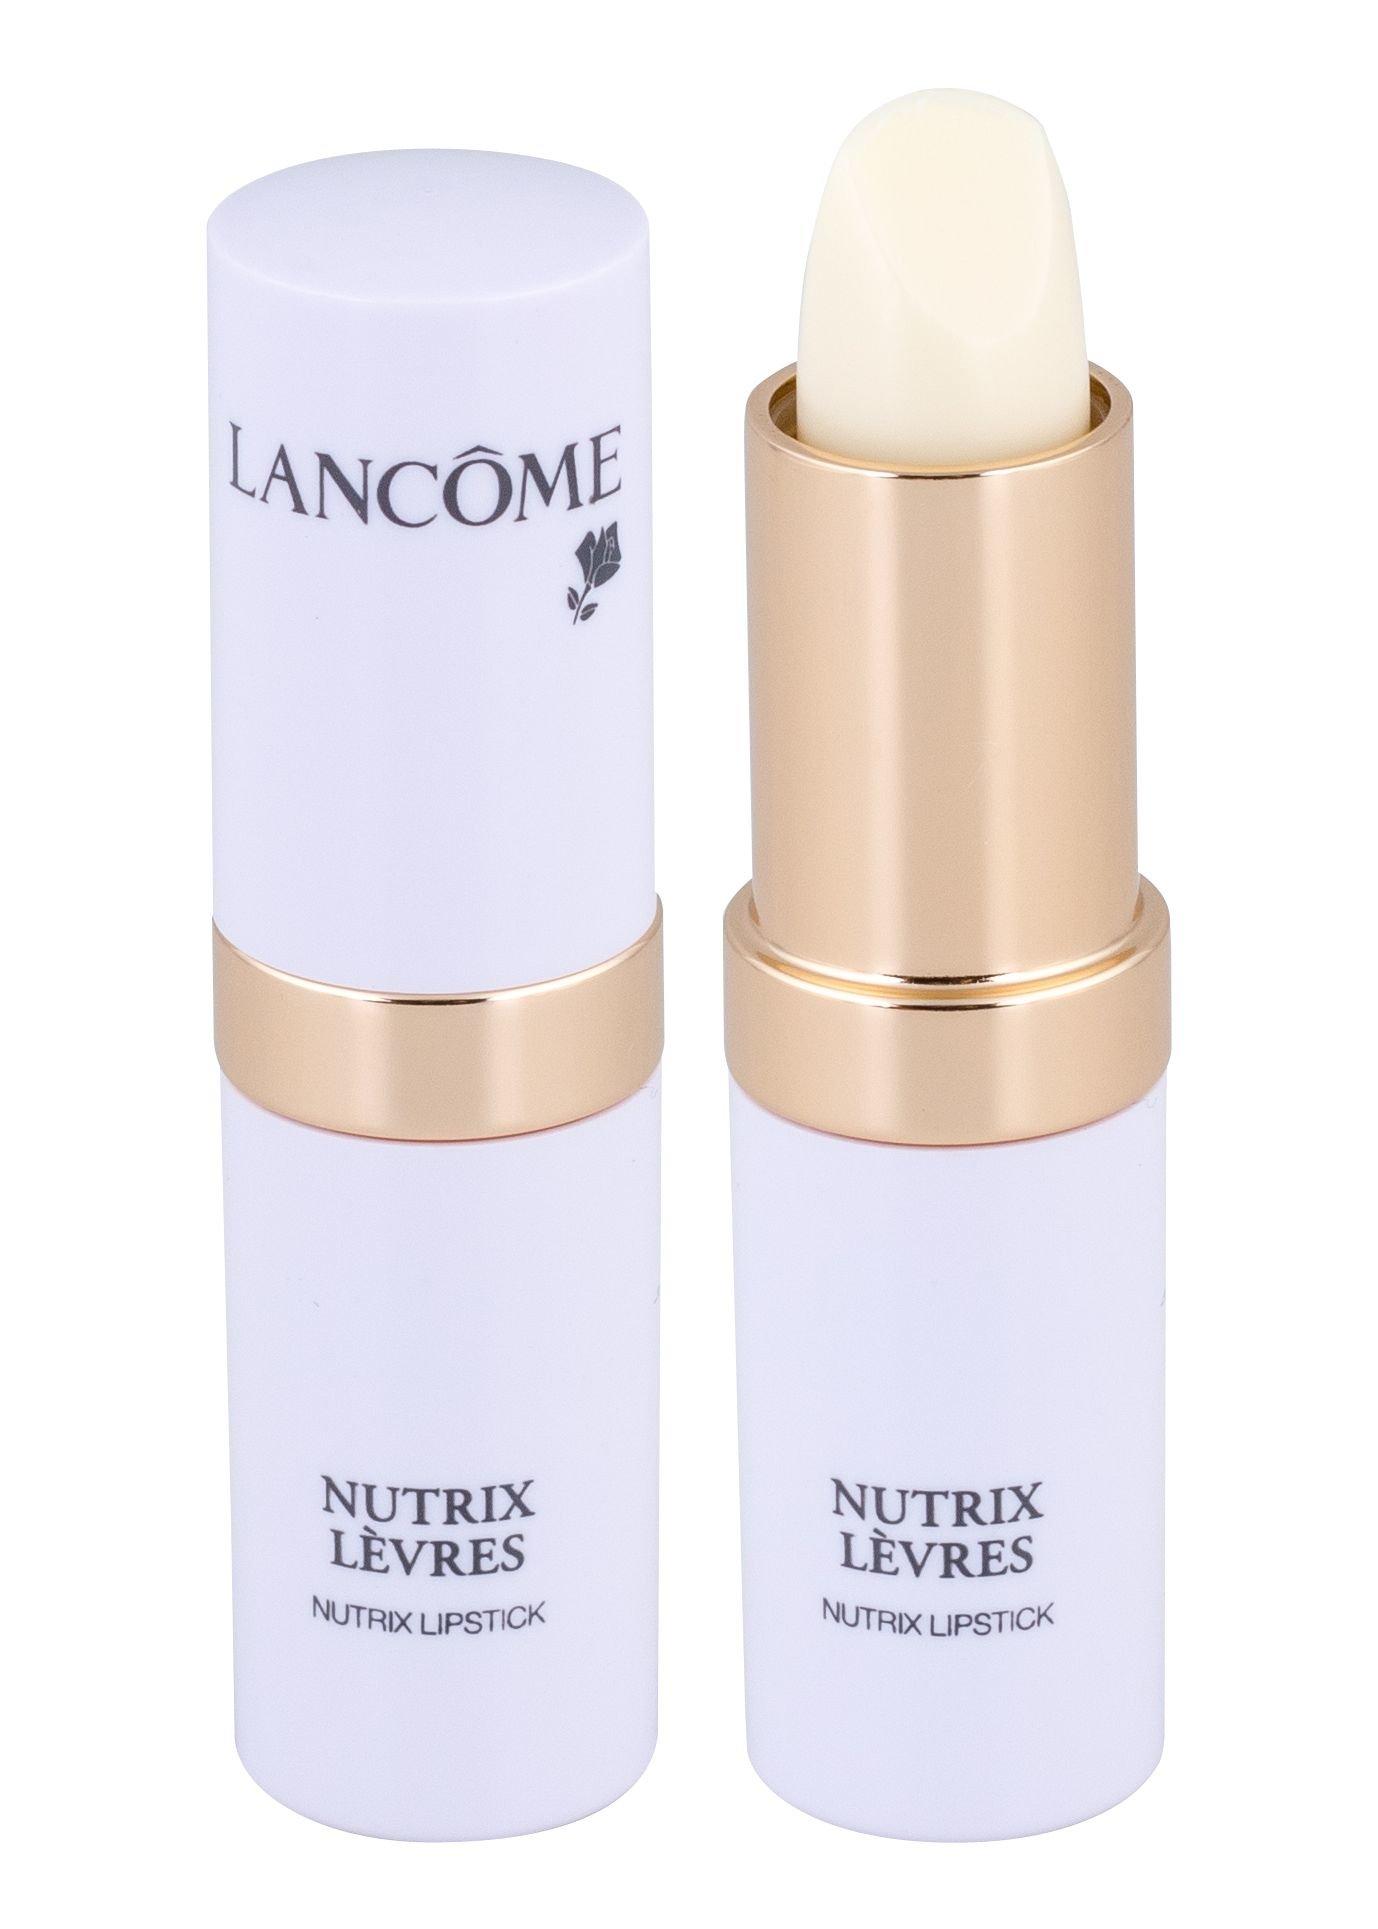 Lancôme Nutrix Levres Cosmetic 4ml